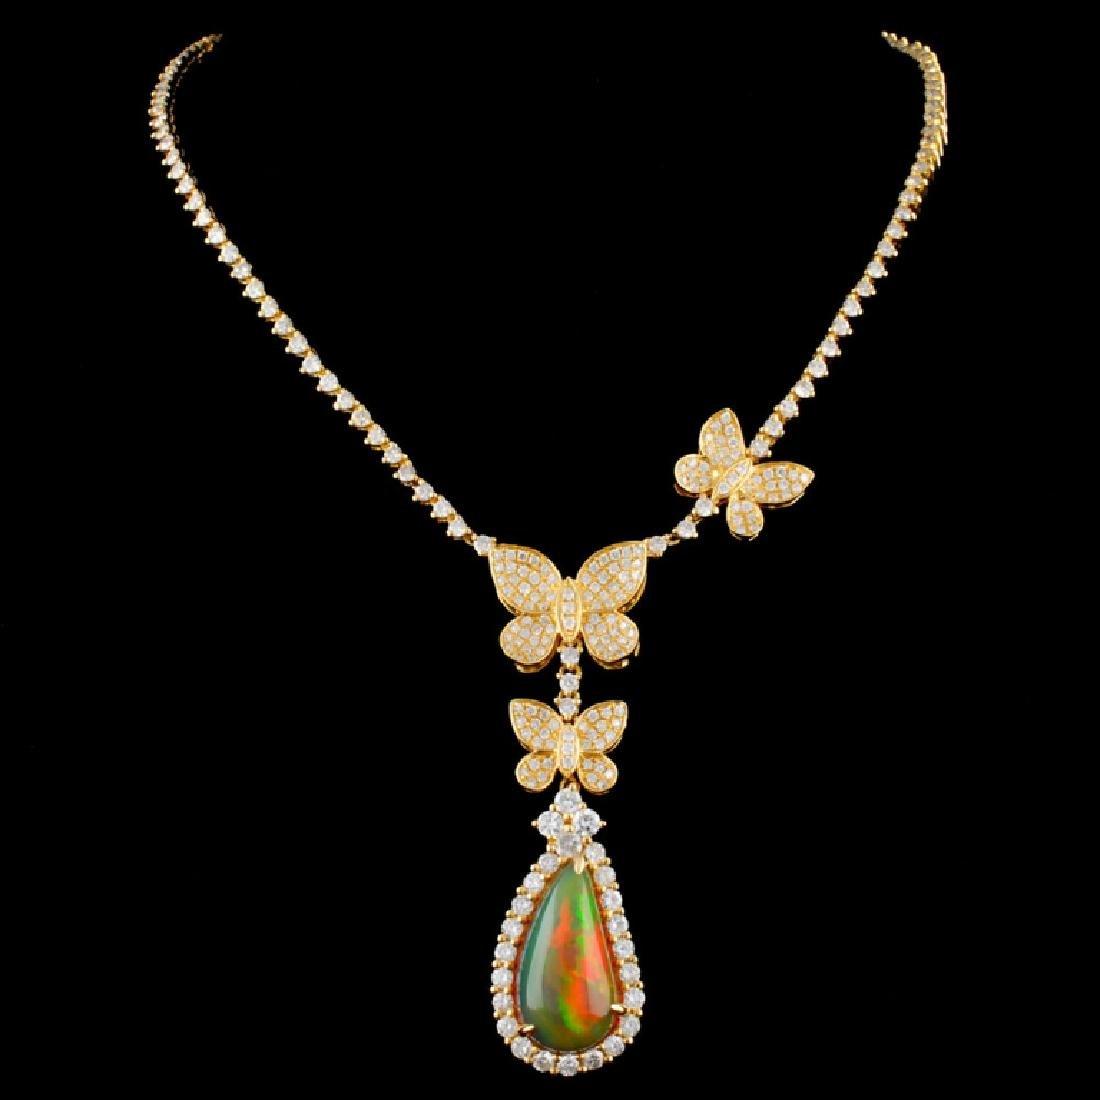 18K Gold 3.72ct Opal & 3.03ctw Diamond Necklace